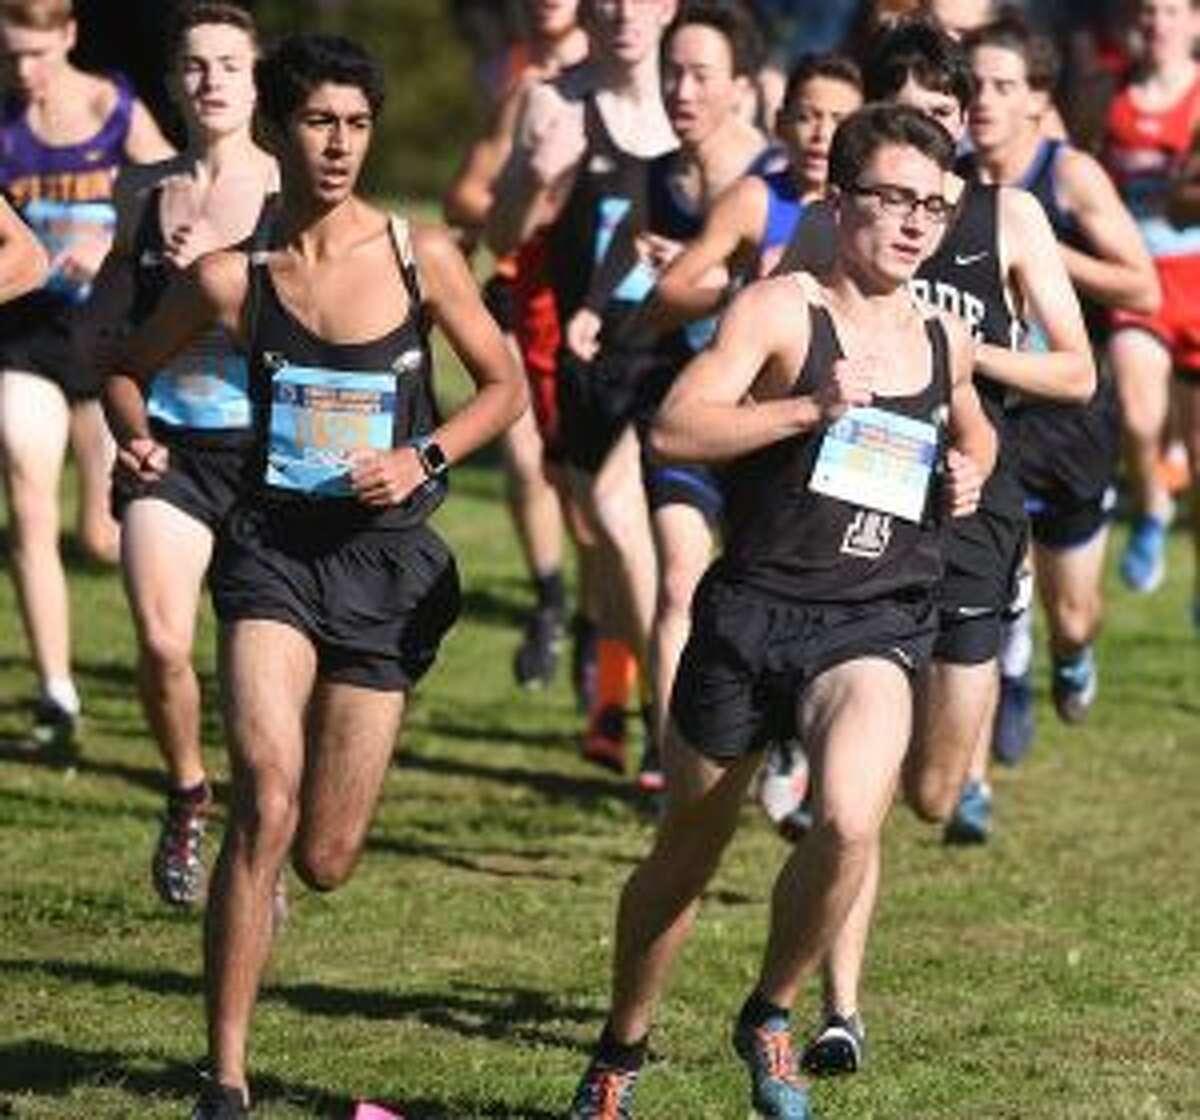 Joe Gregory and Owen Hopwood lead the way. - Dave Stewart photo